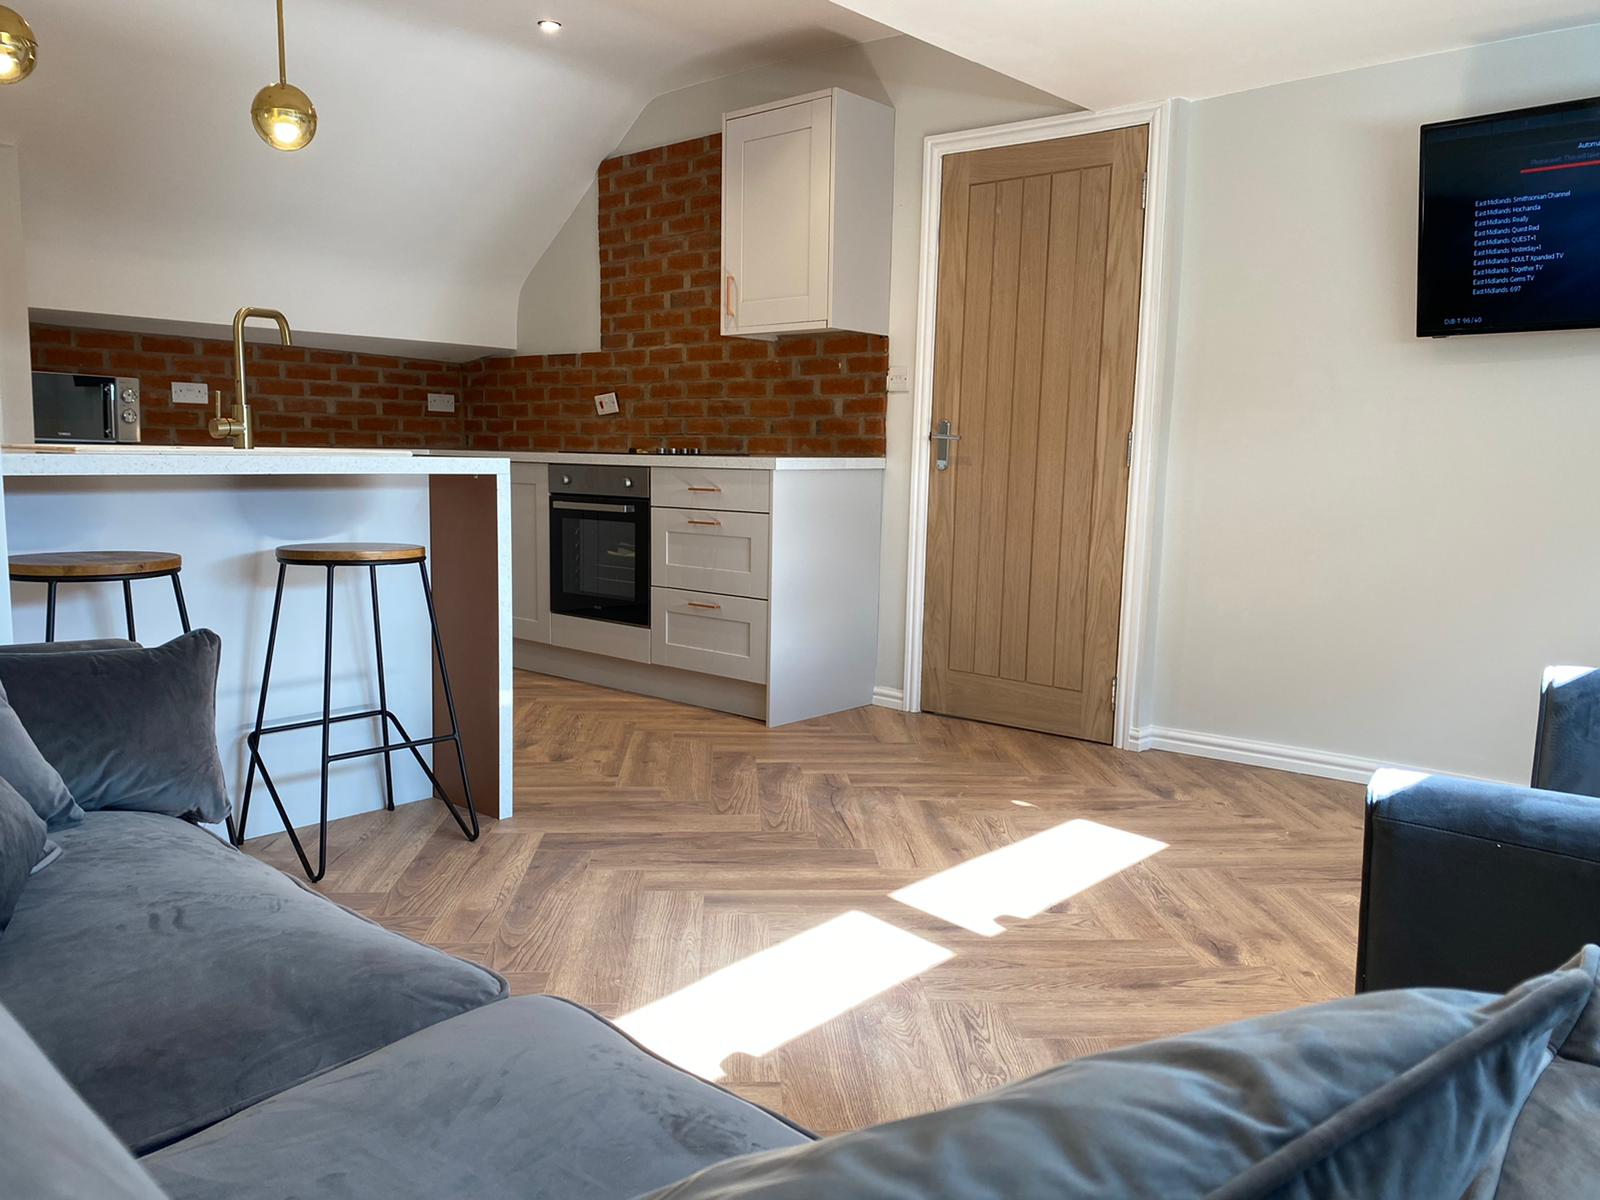 Flat 5, Lenton Blvd – 2 Bed